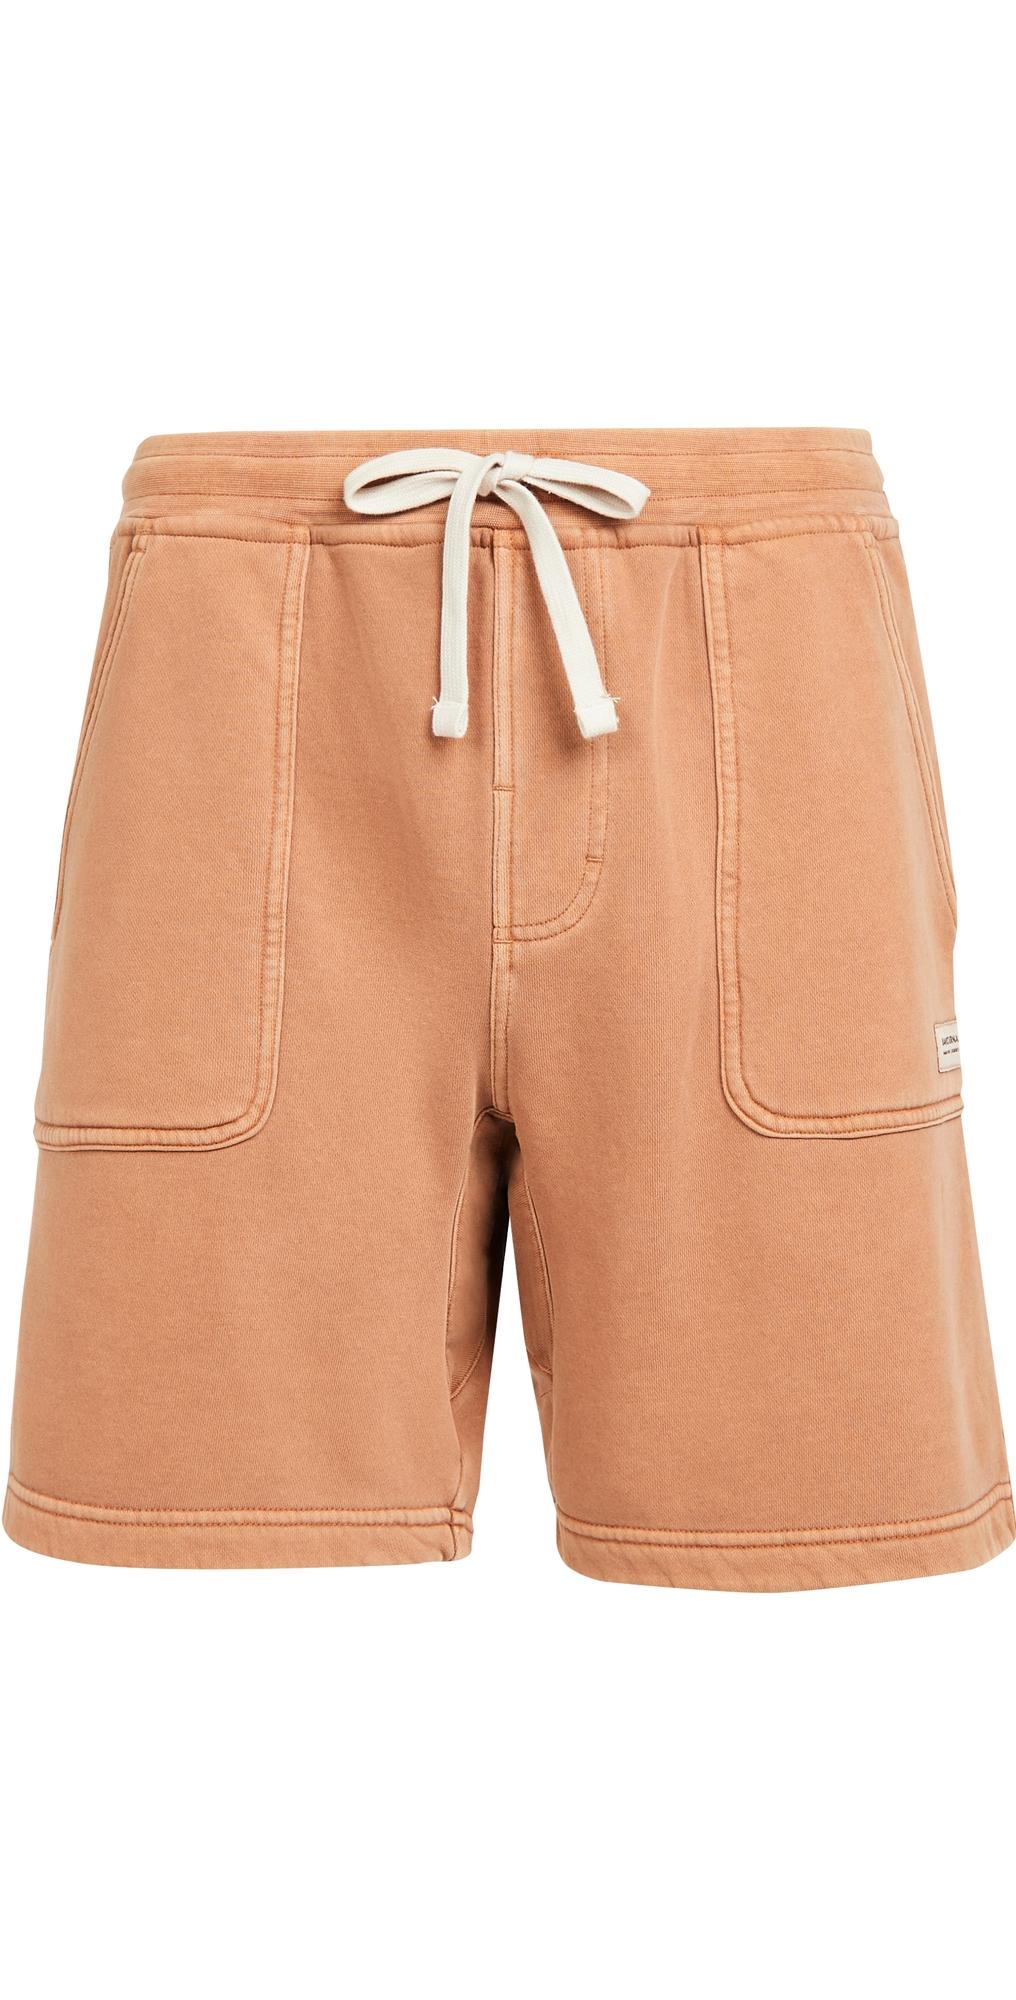 Big Bear Fleece Shorts